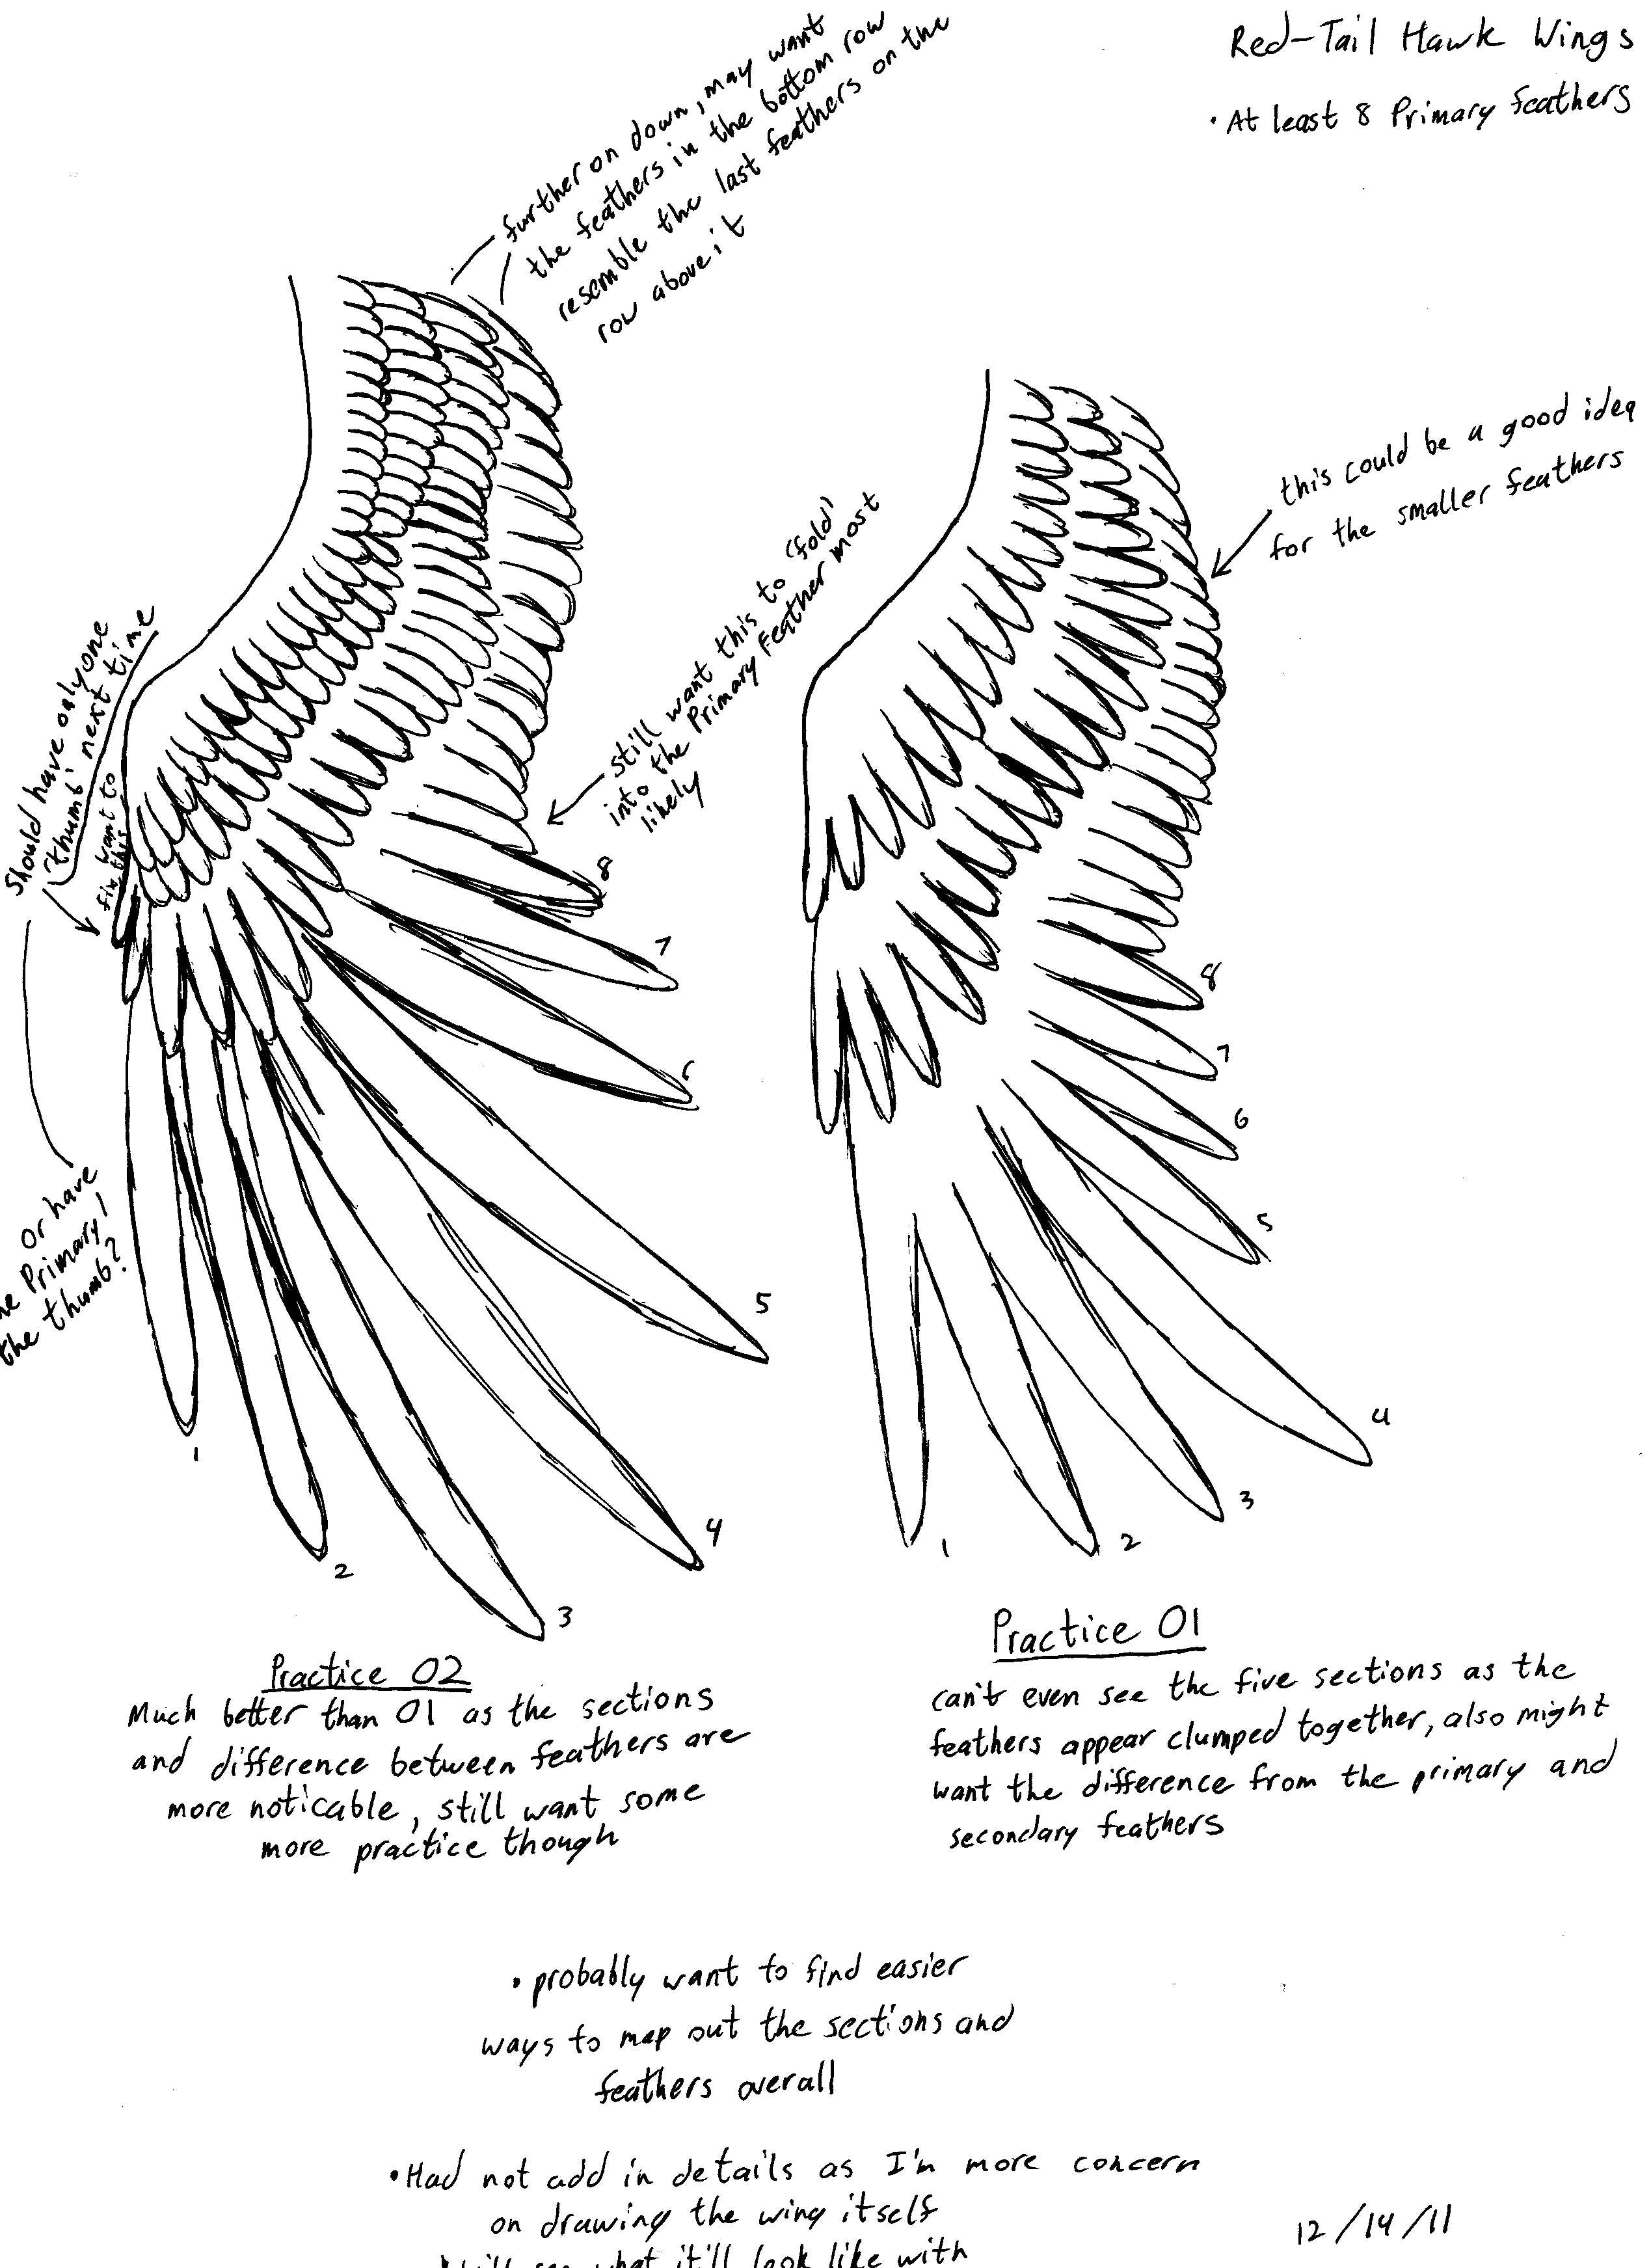 Digivolution Chart Kiimon By Chameleonveil On Deviantart Eye Diagram Brittlebear Red Tail Hawk 02 Neohydra77